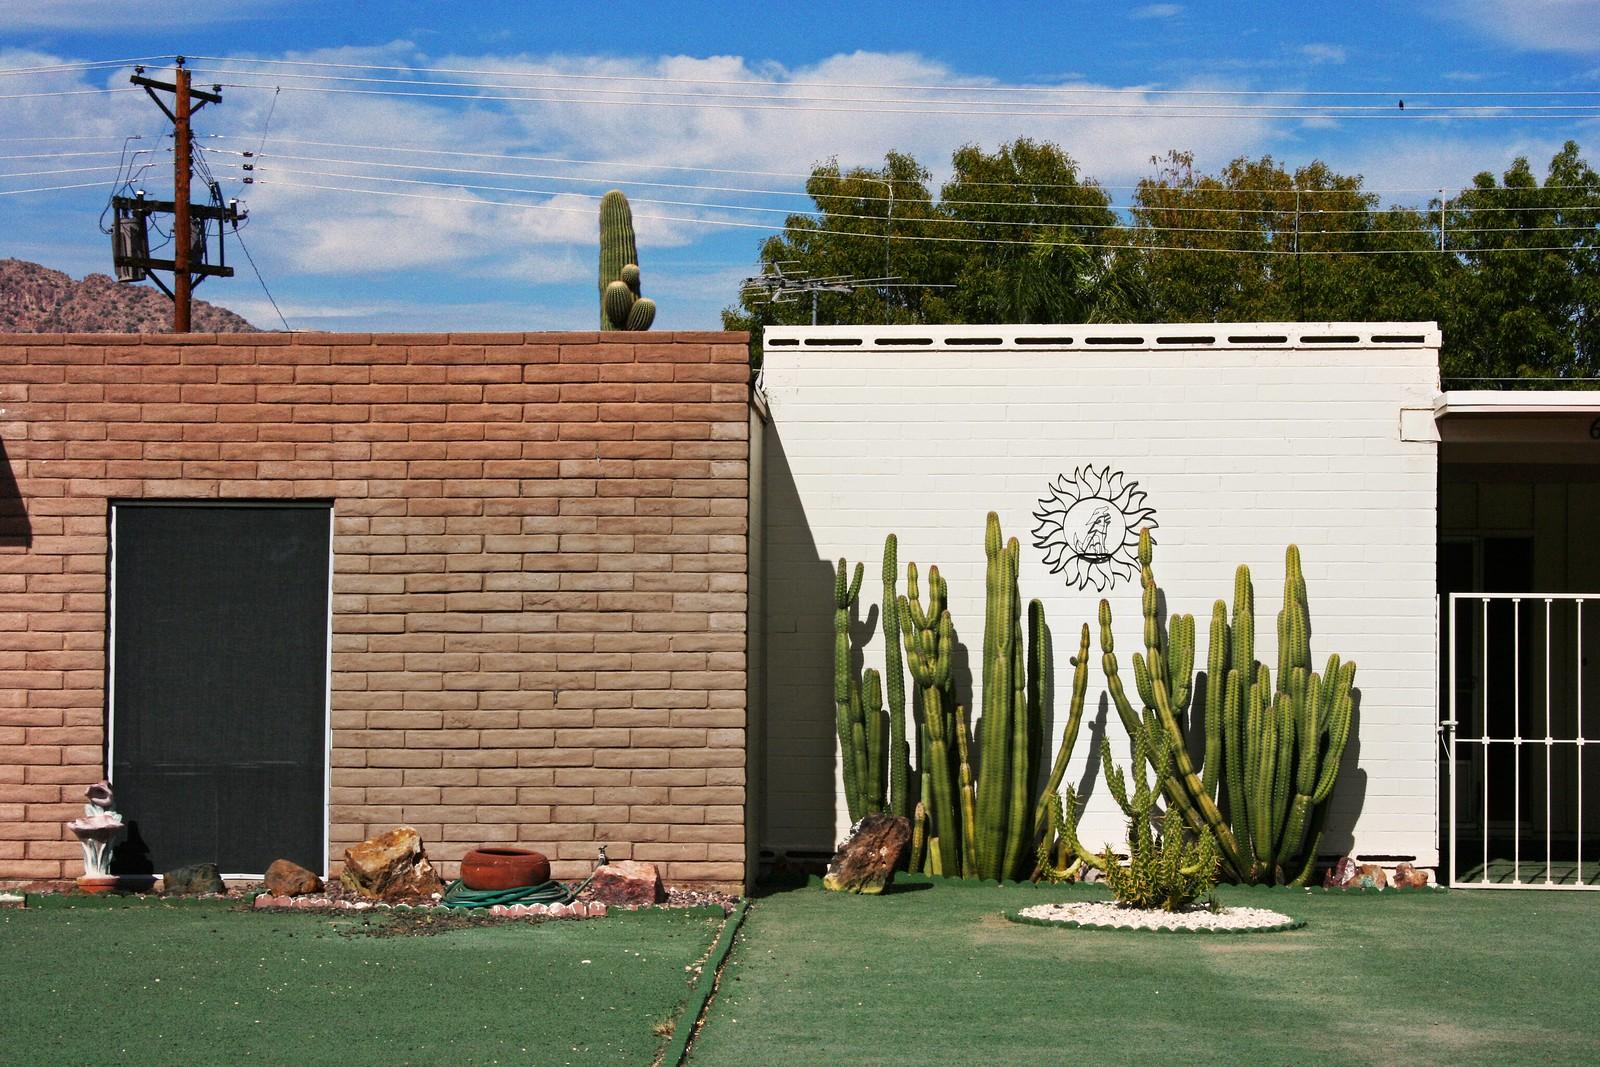 Astroturf Paradise, Scottsdale, Arizona, 2006